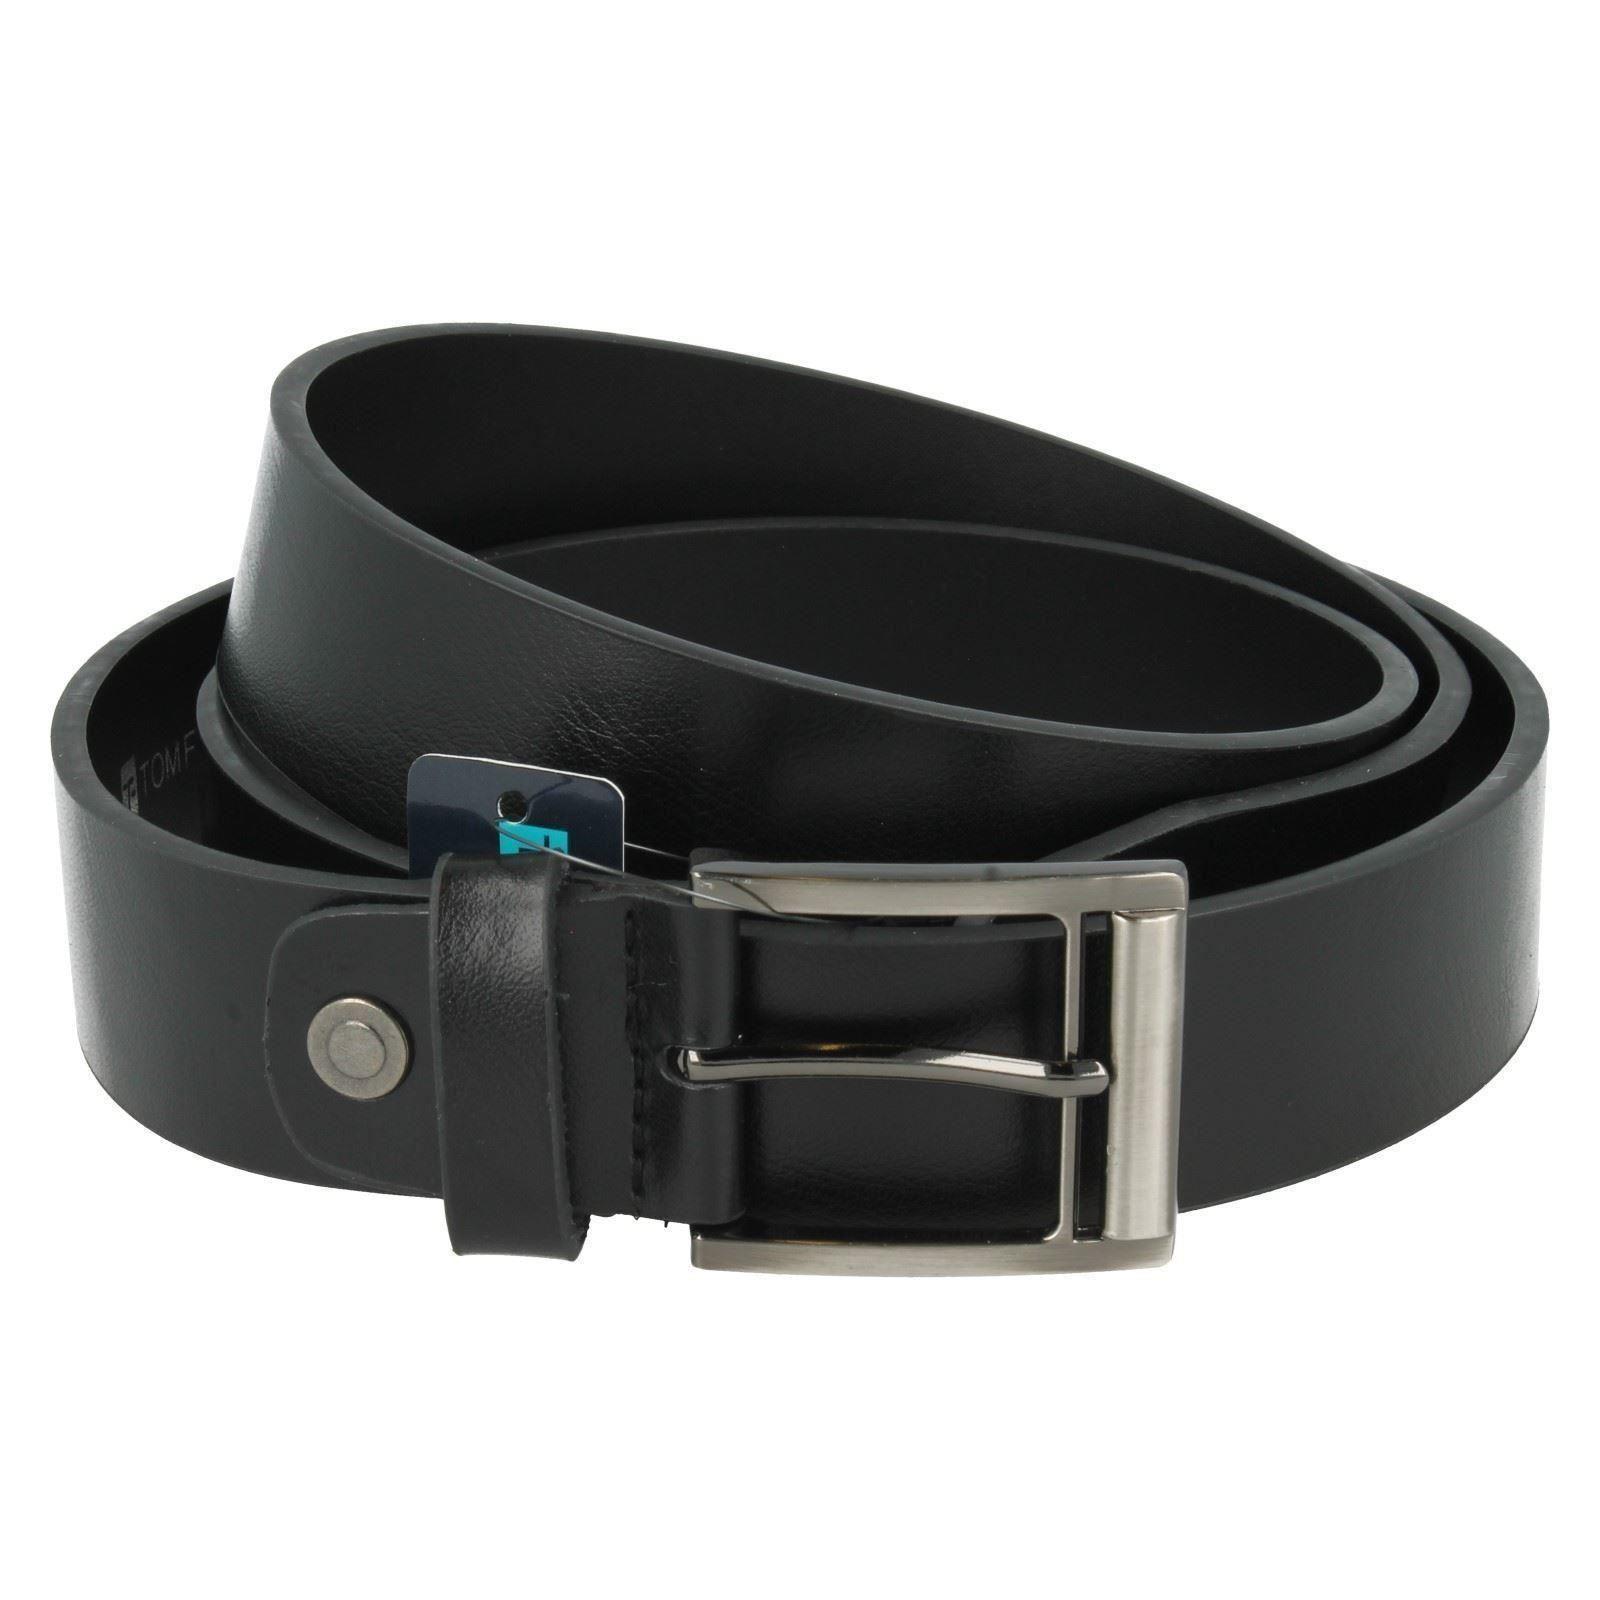 Tomfranks-Gamuza-Negra-para-Hombre-Cinturon-De-Cuero-BL109